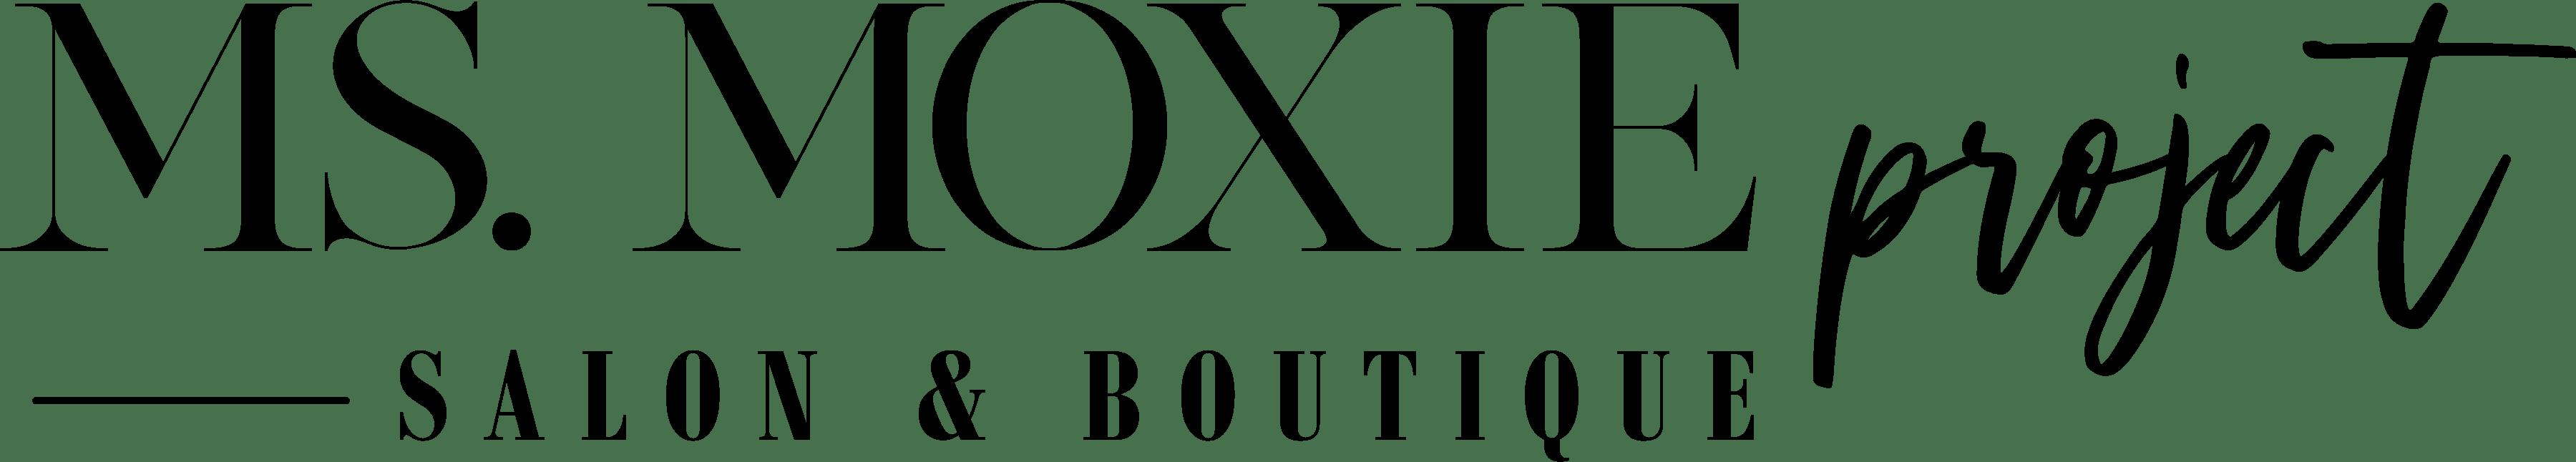 Ms. Moxie Project Logo